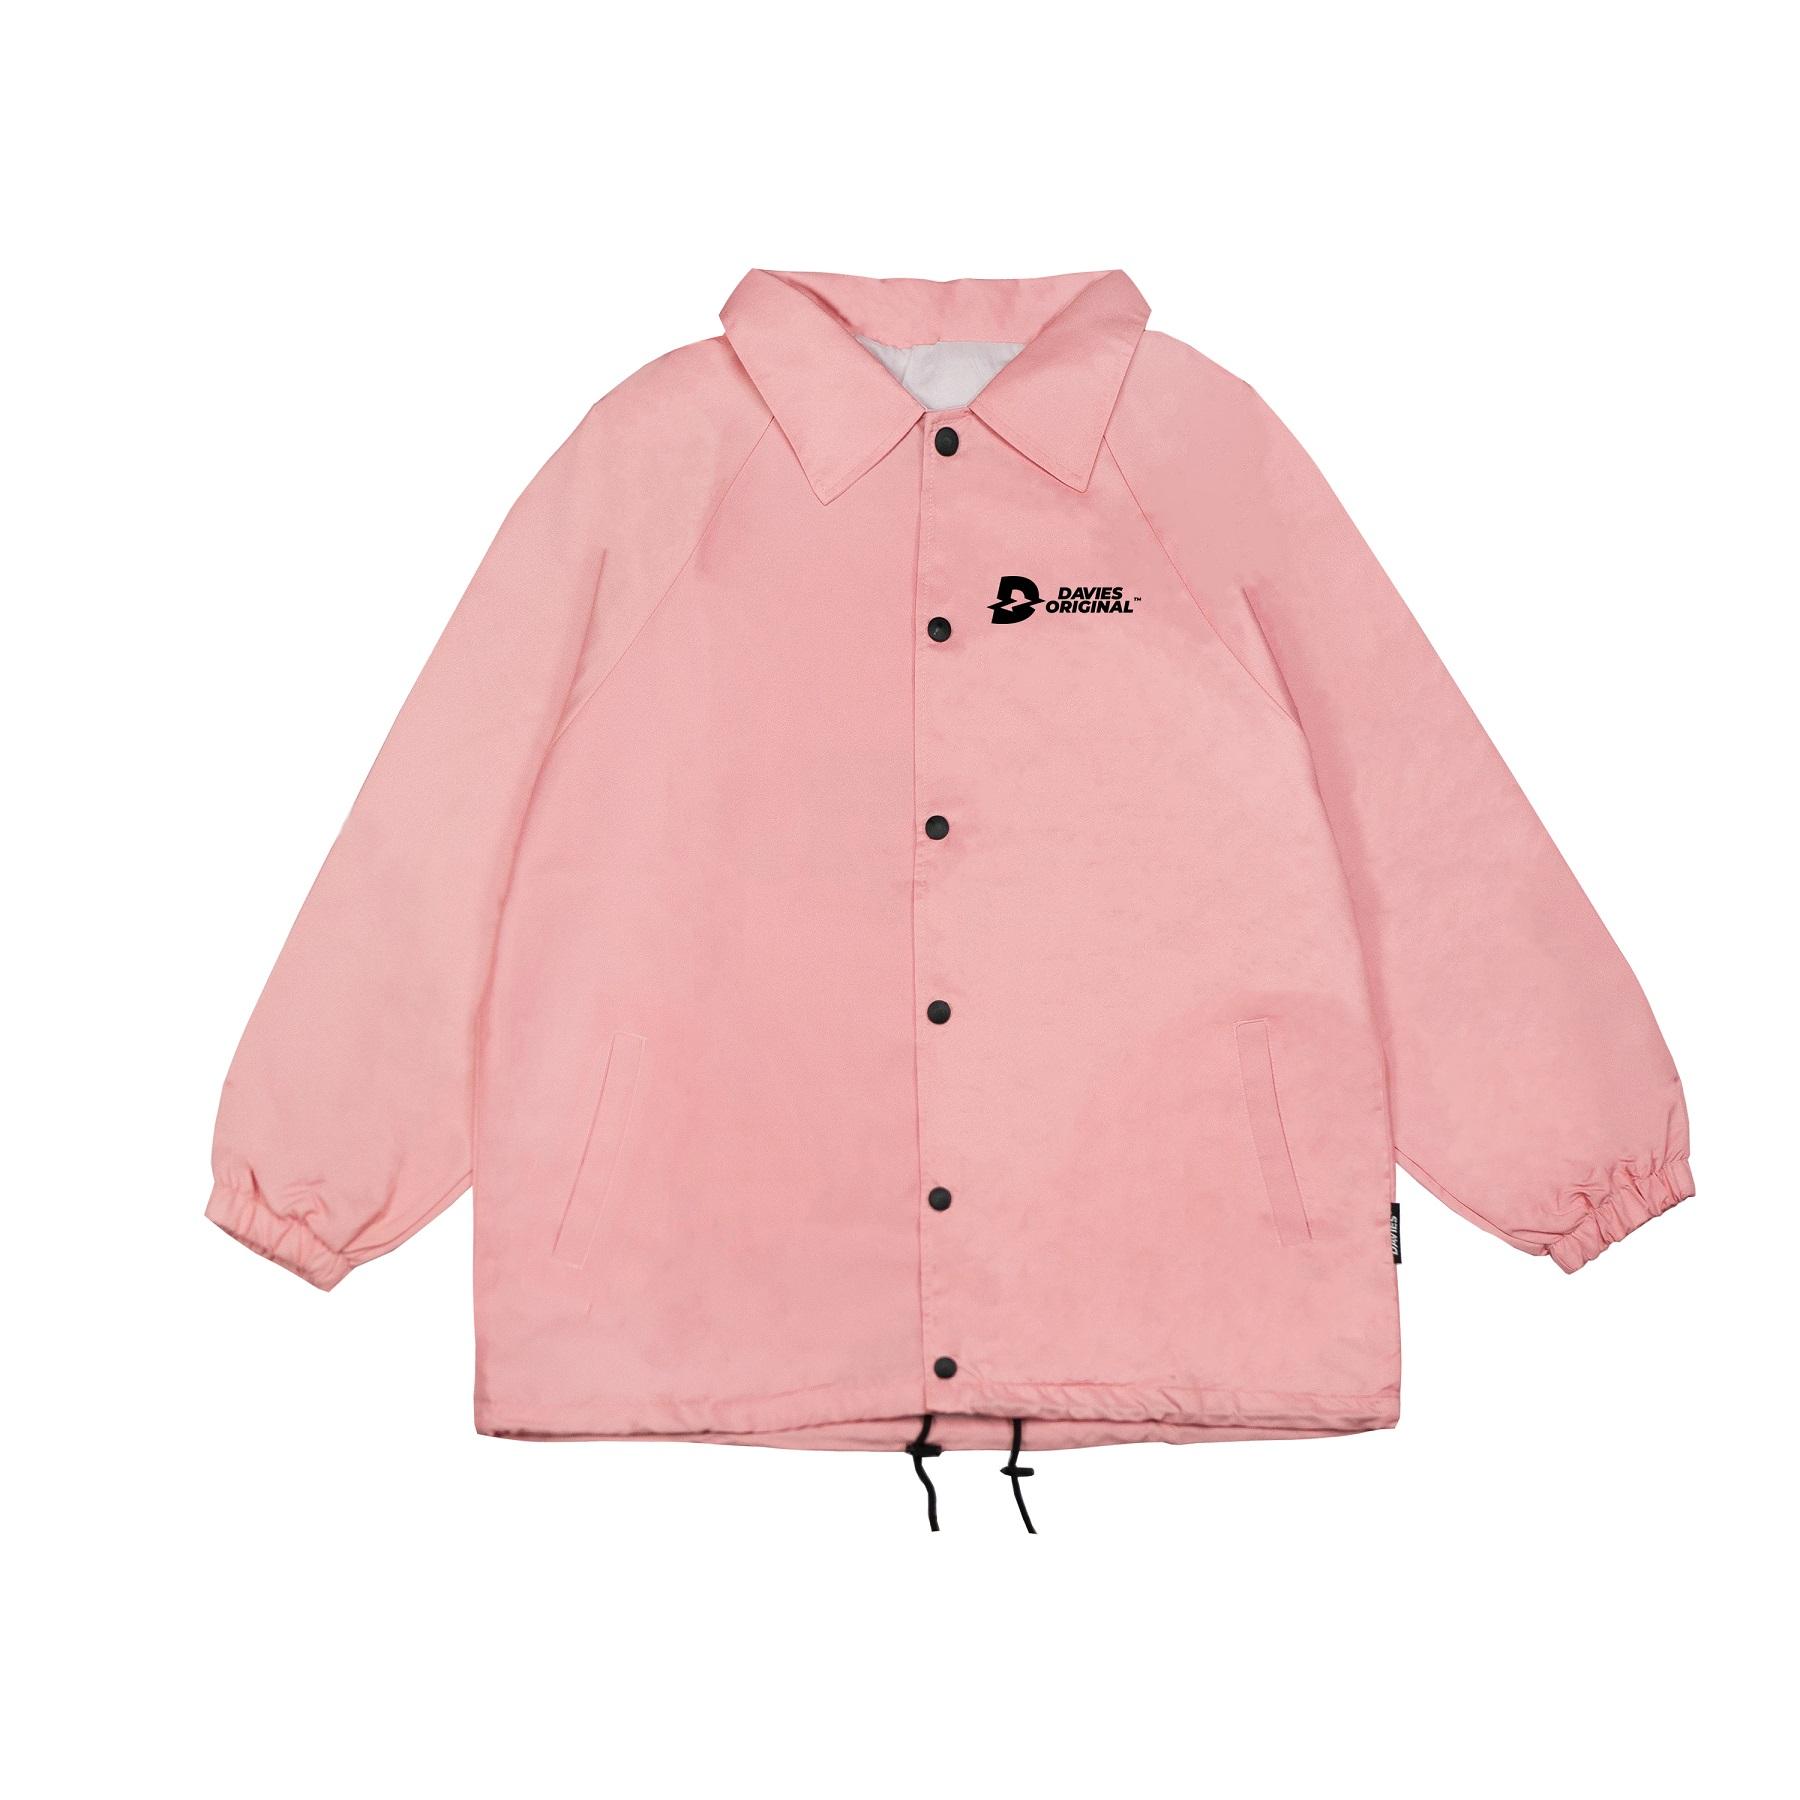 DSW Jacket Original Pink